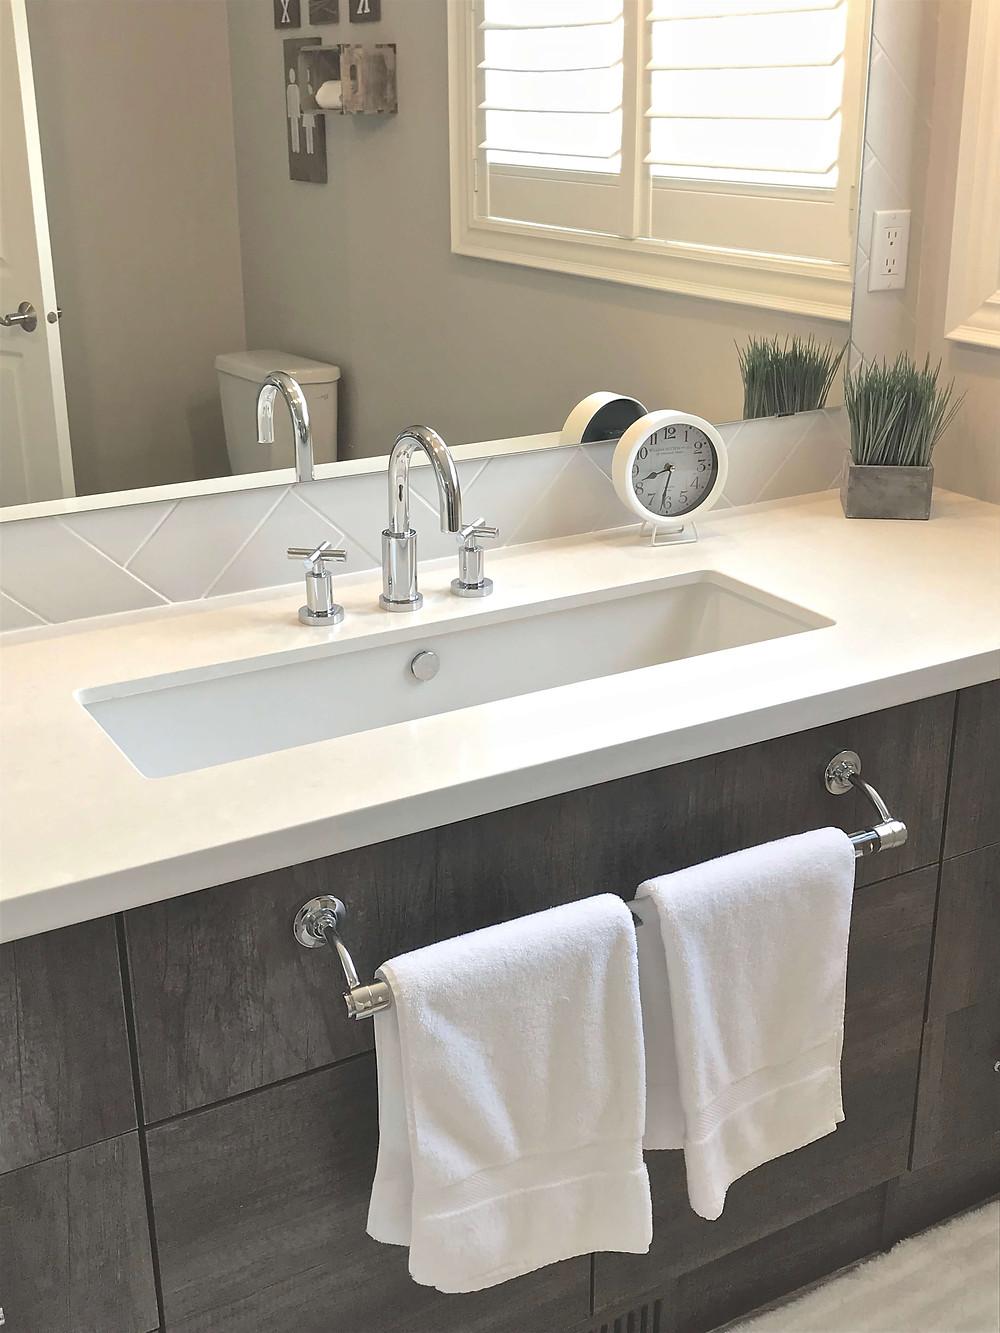 Trough sink in rustic style bathroom by Georgia's Design